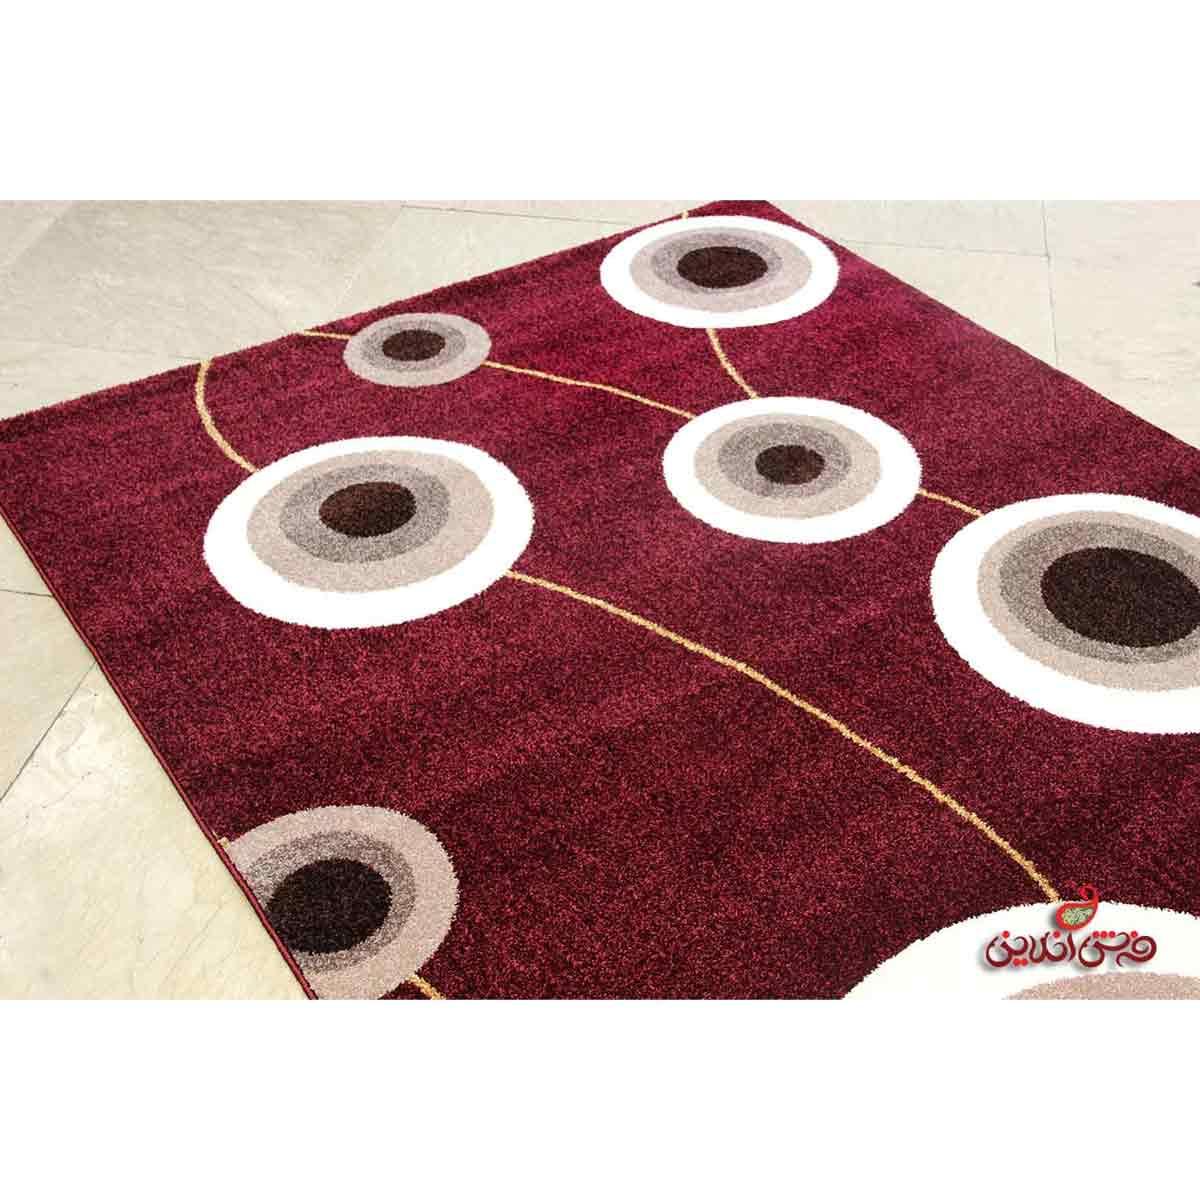 فرش  ماشینی ساوین طرح بهرنگ زرشکی